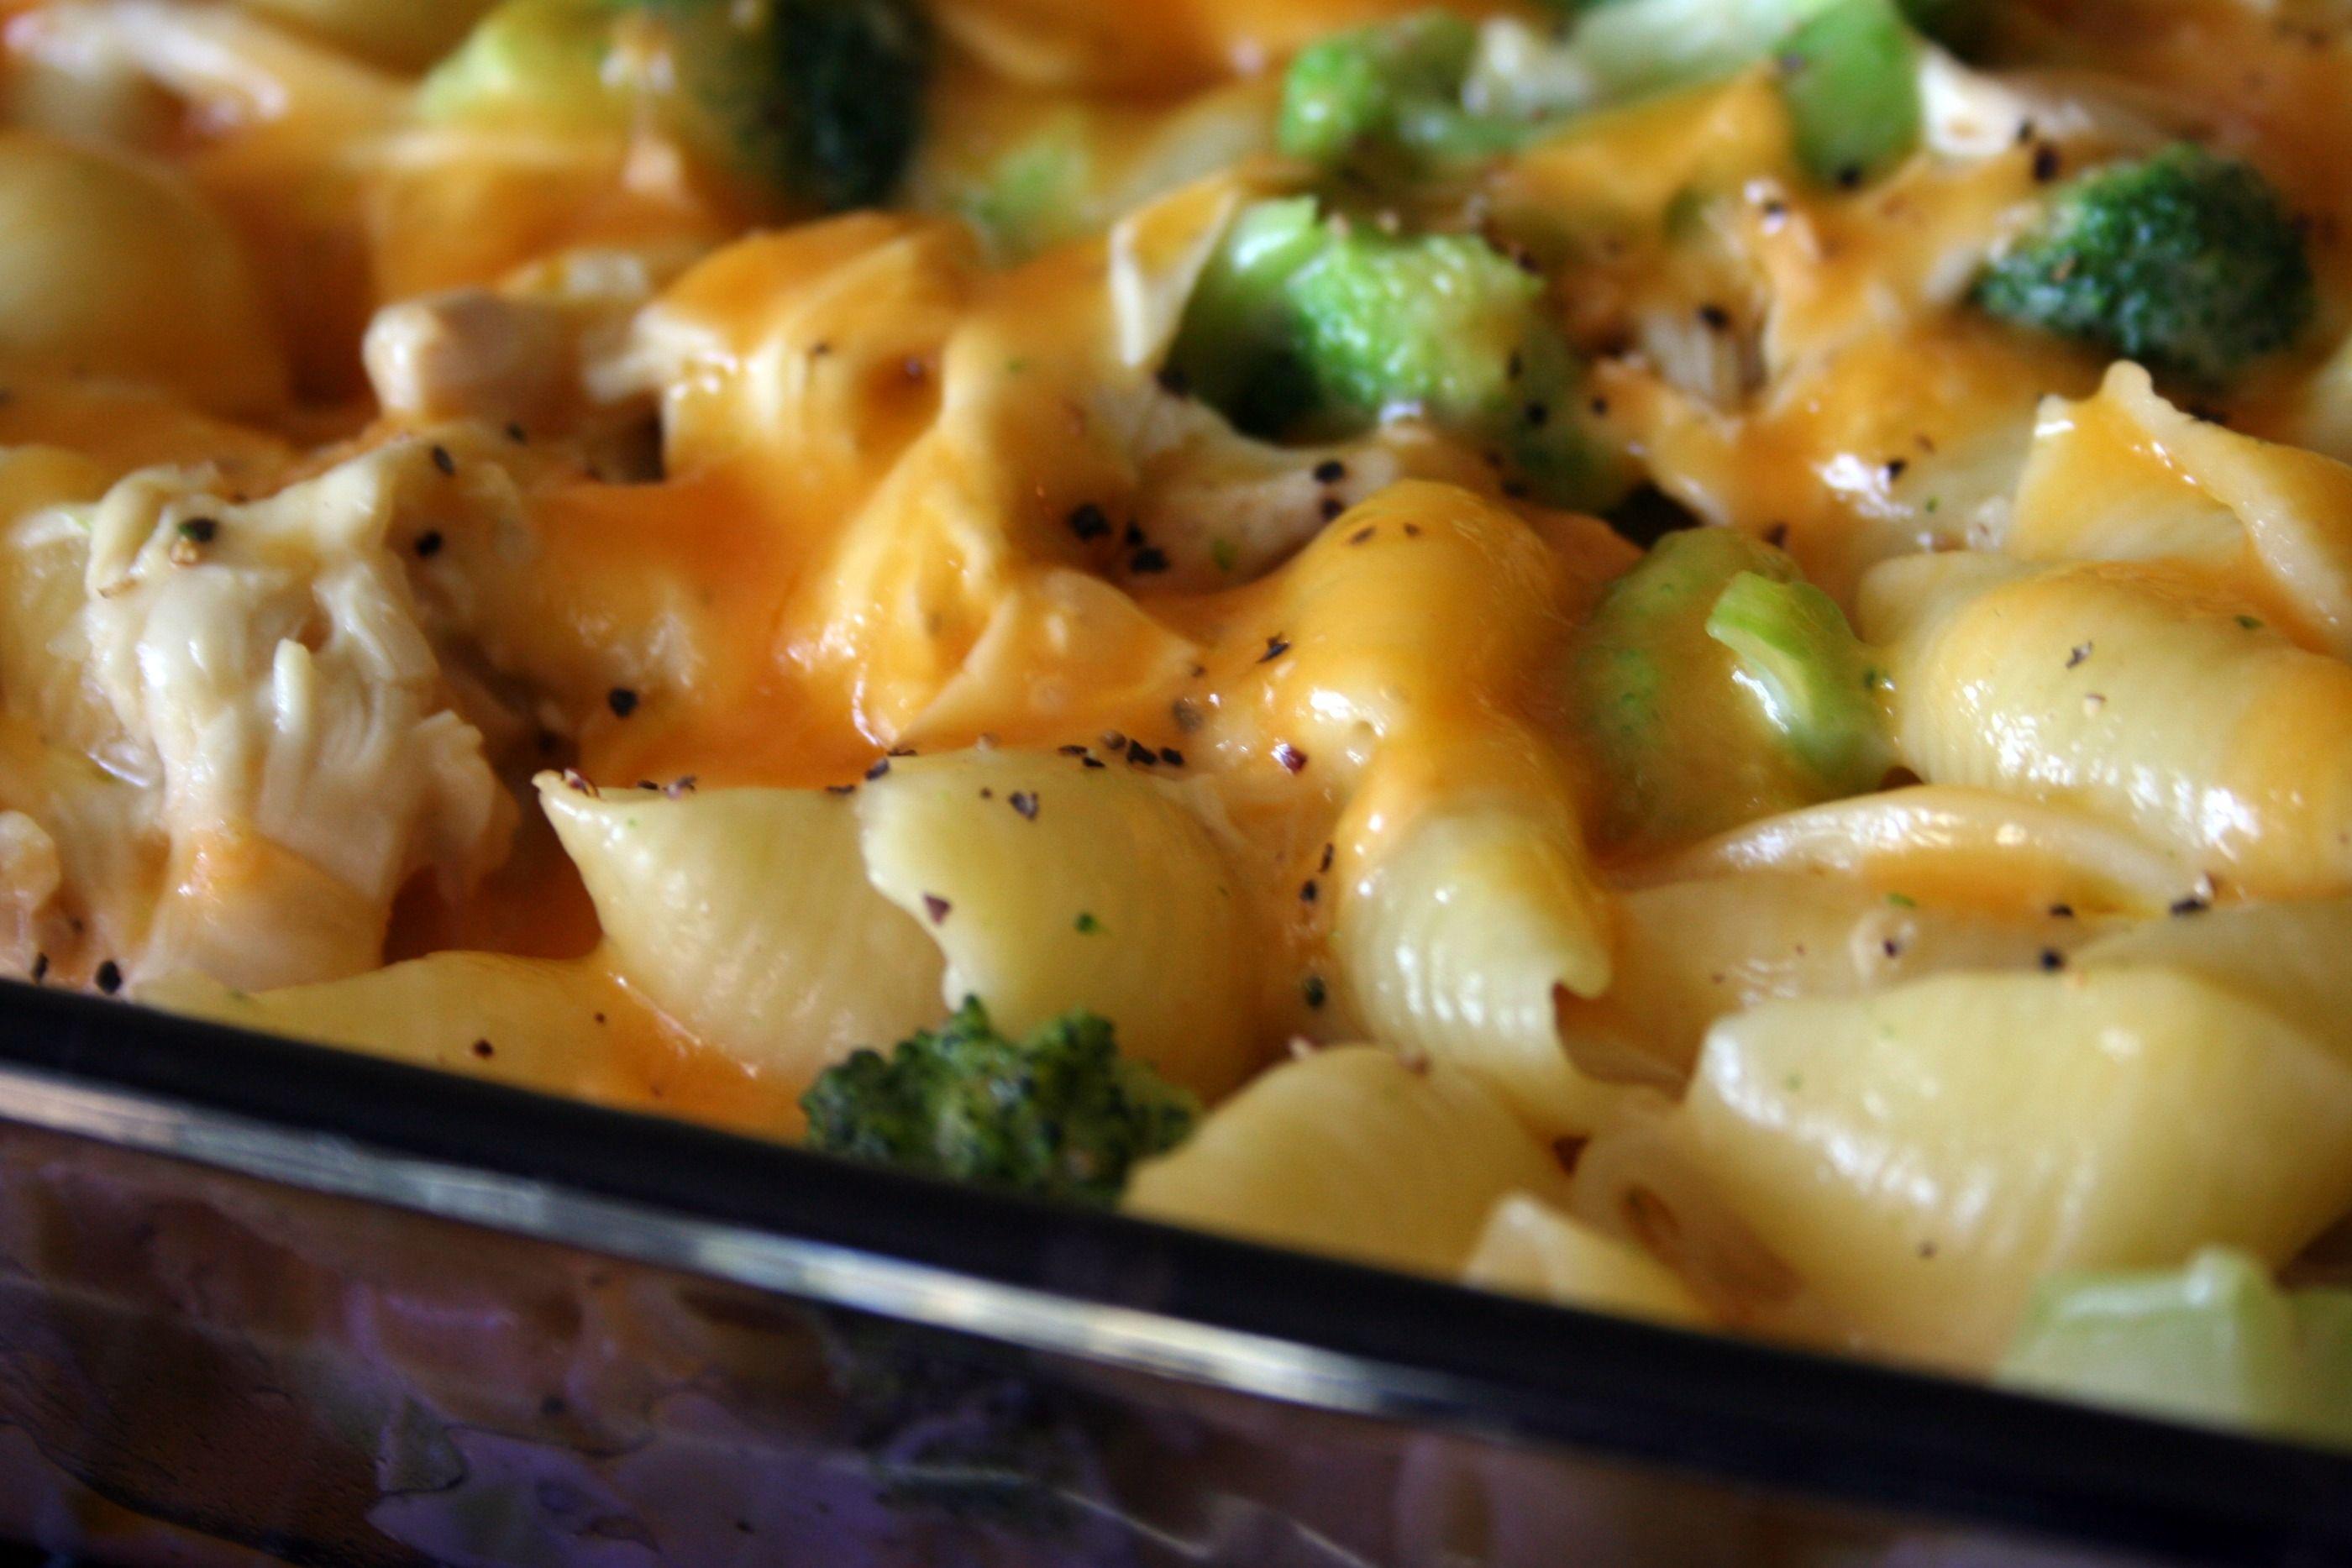 Broccoli cheese pasta bake recipe